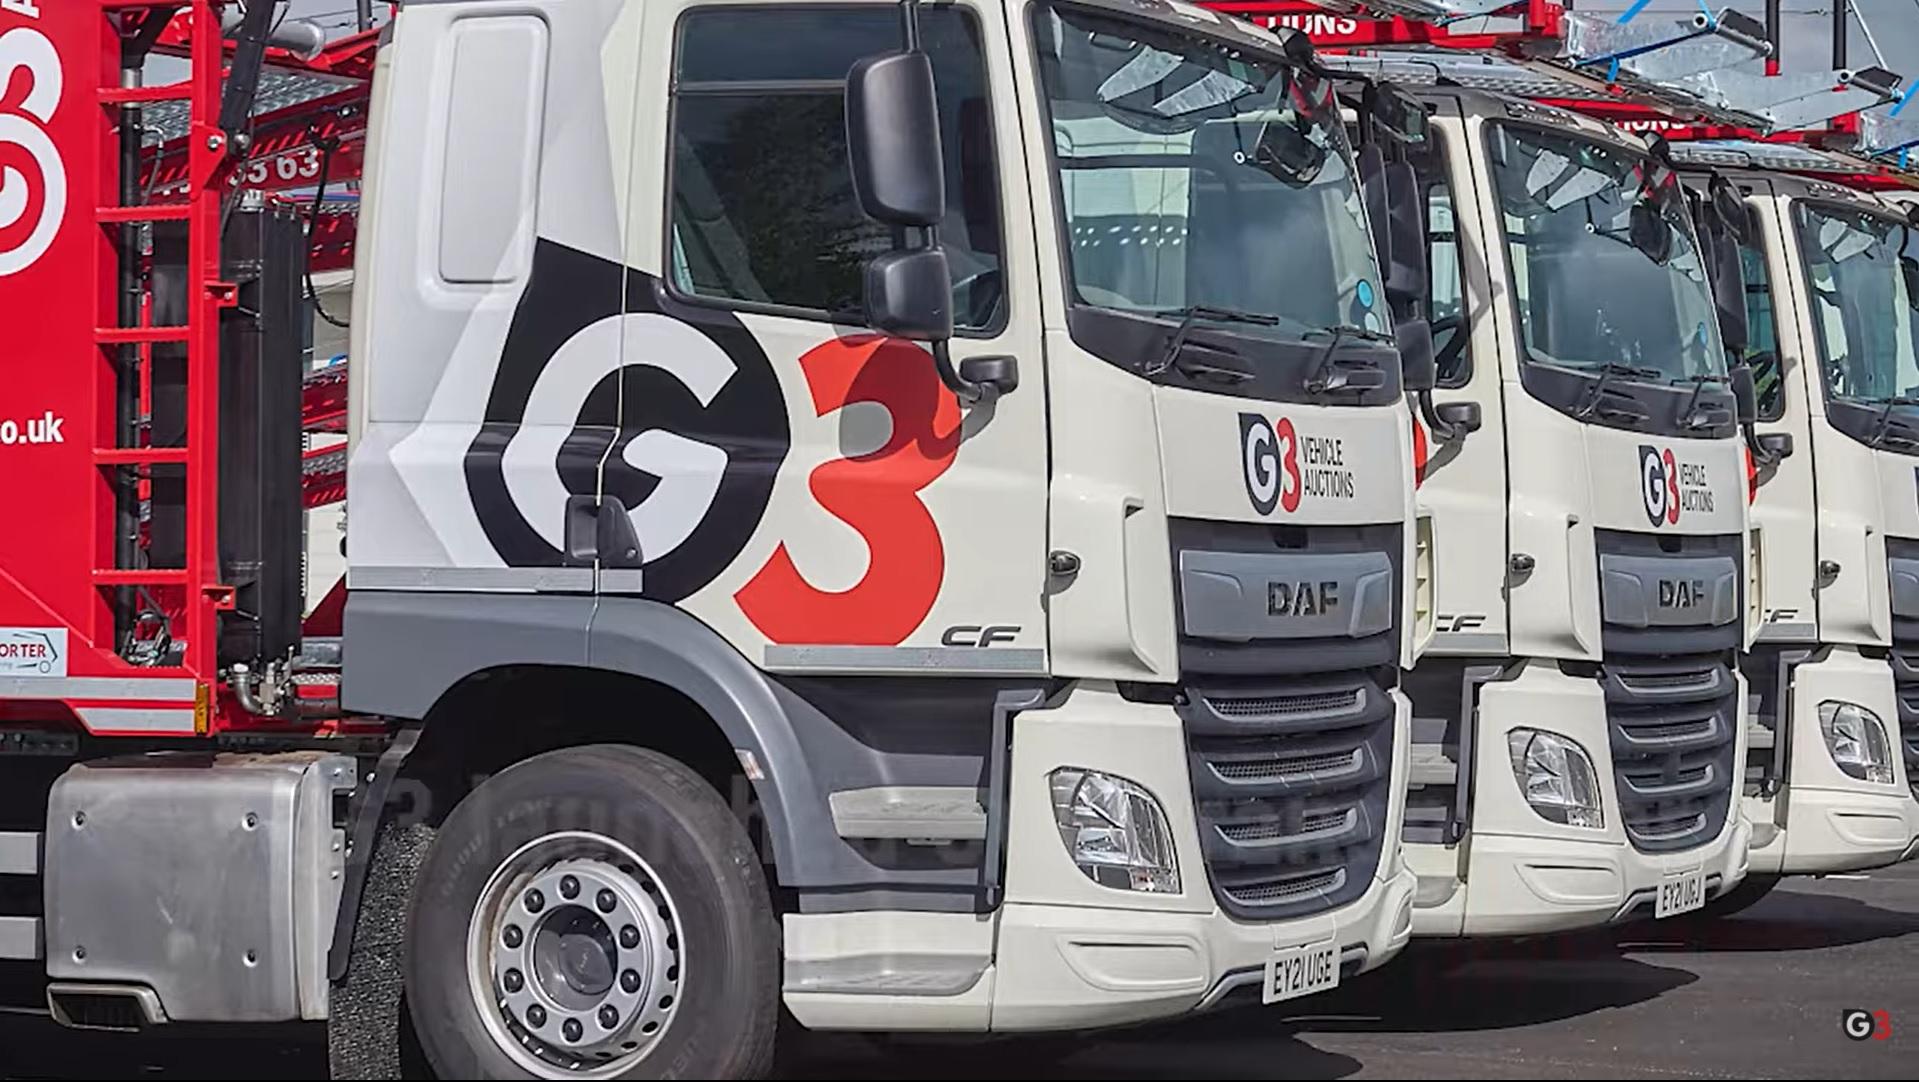 g3 trucks with 4g camera system sm uk